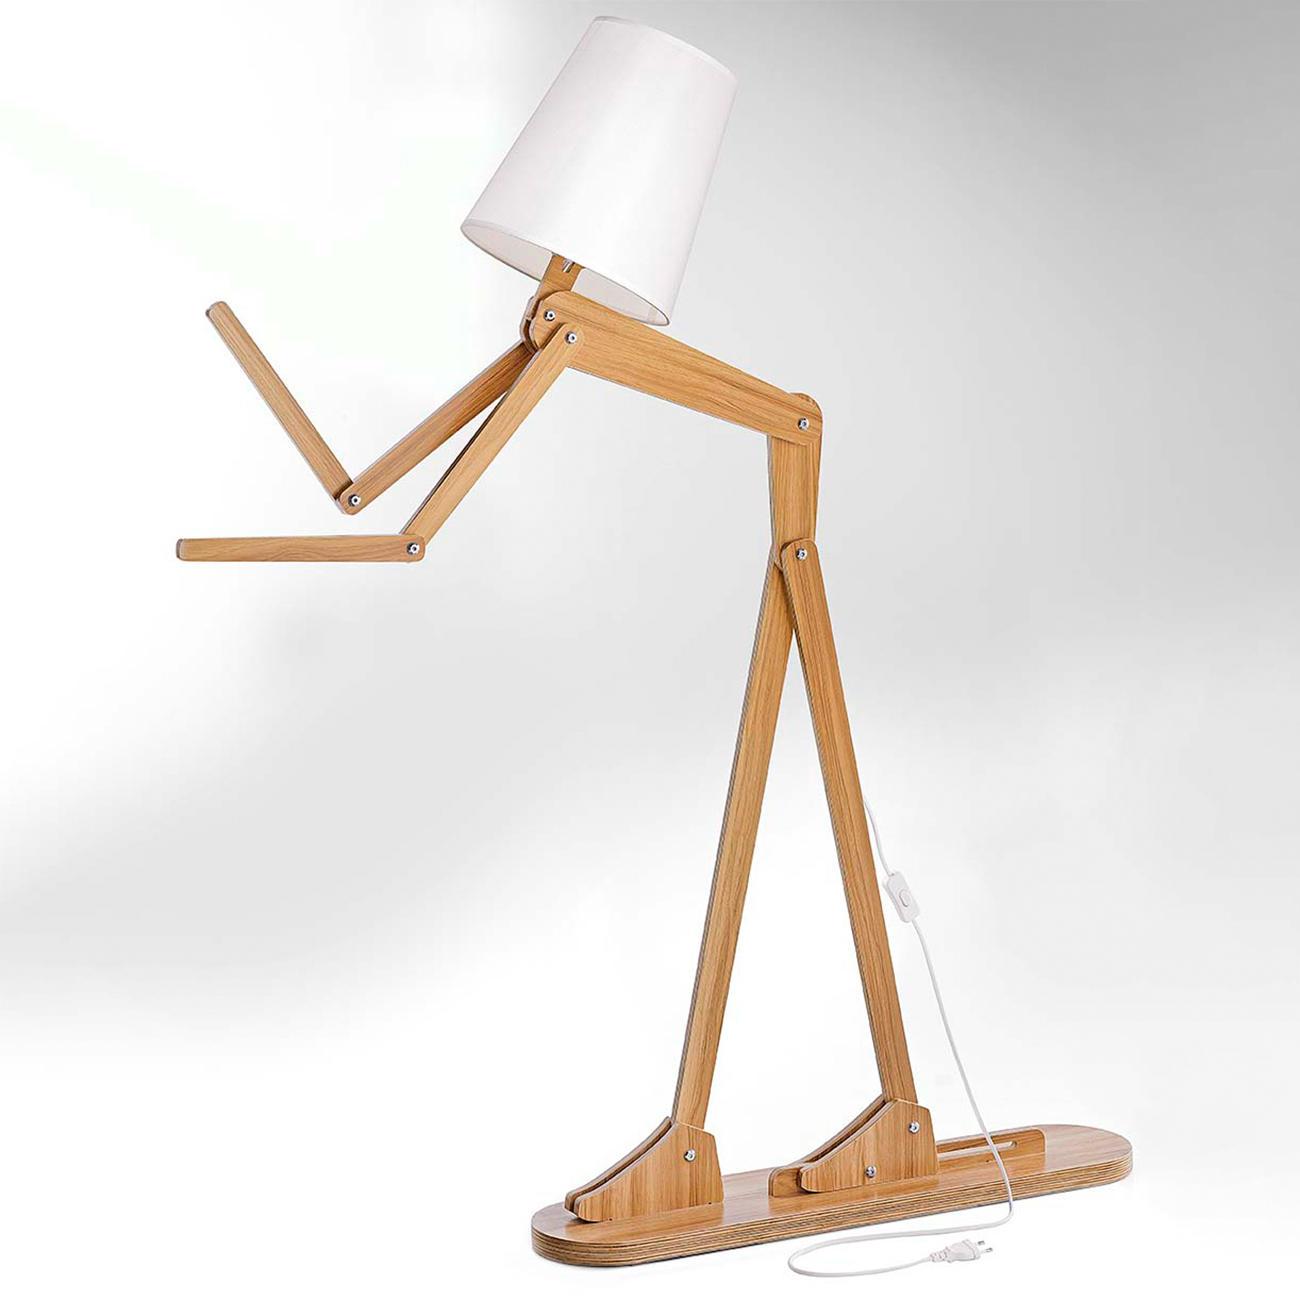 stehleuchte mensch linden sperrholz online kaufen. Black Bedroom Furniture Sets. Home Design Ideas